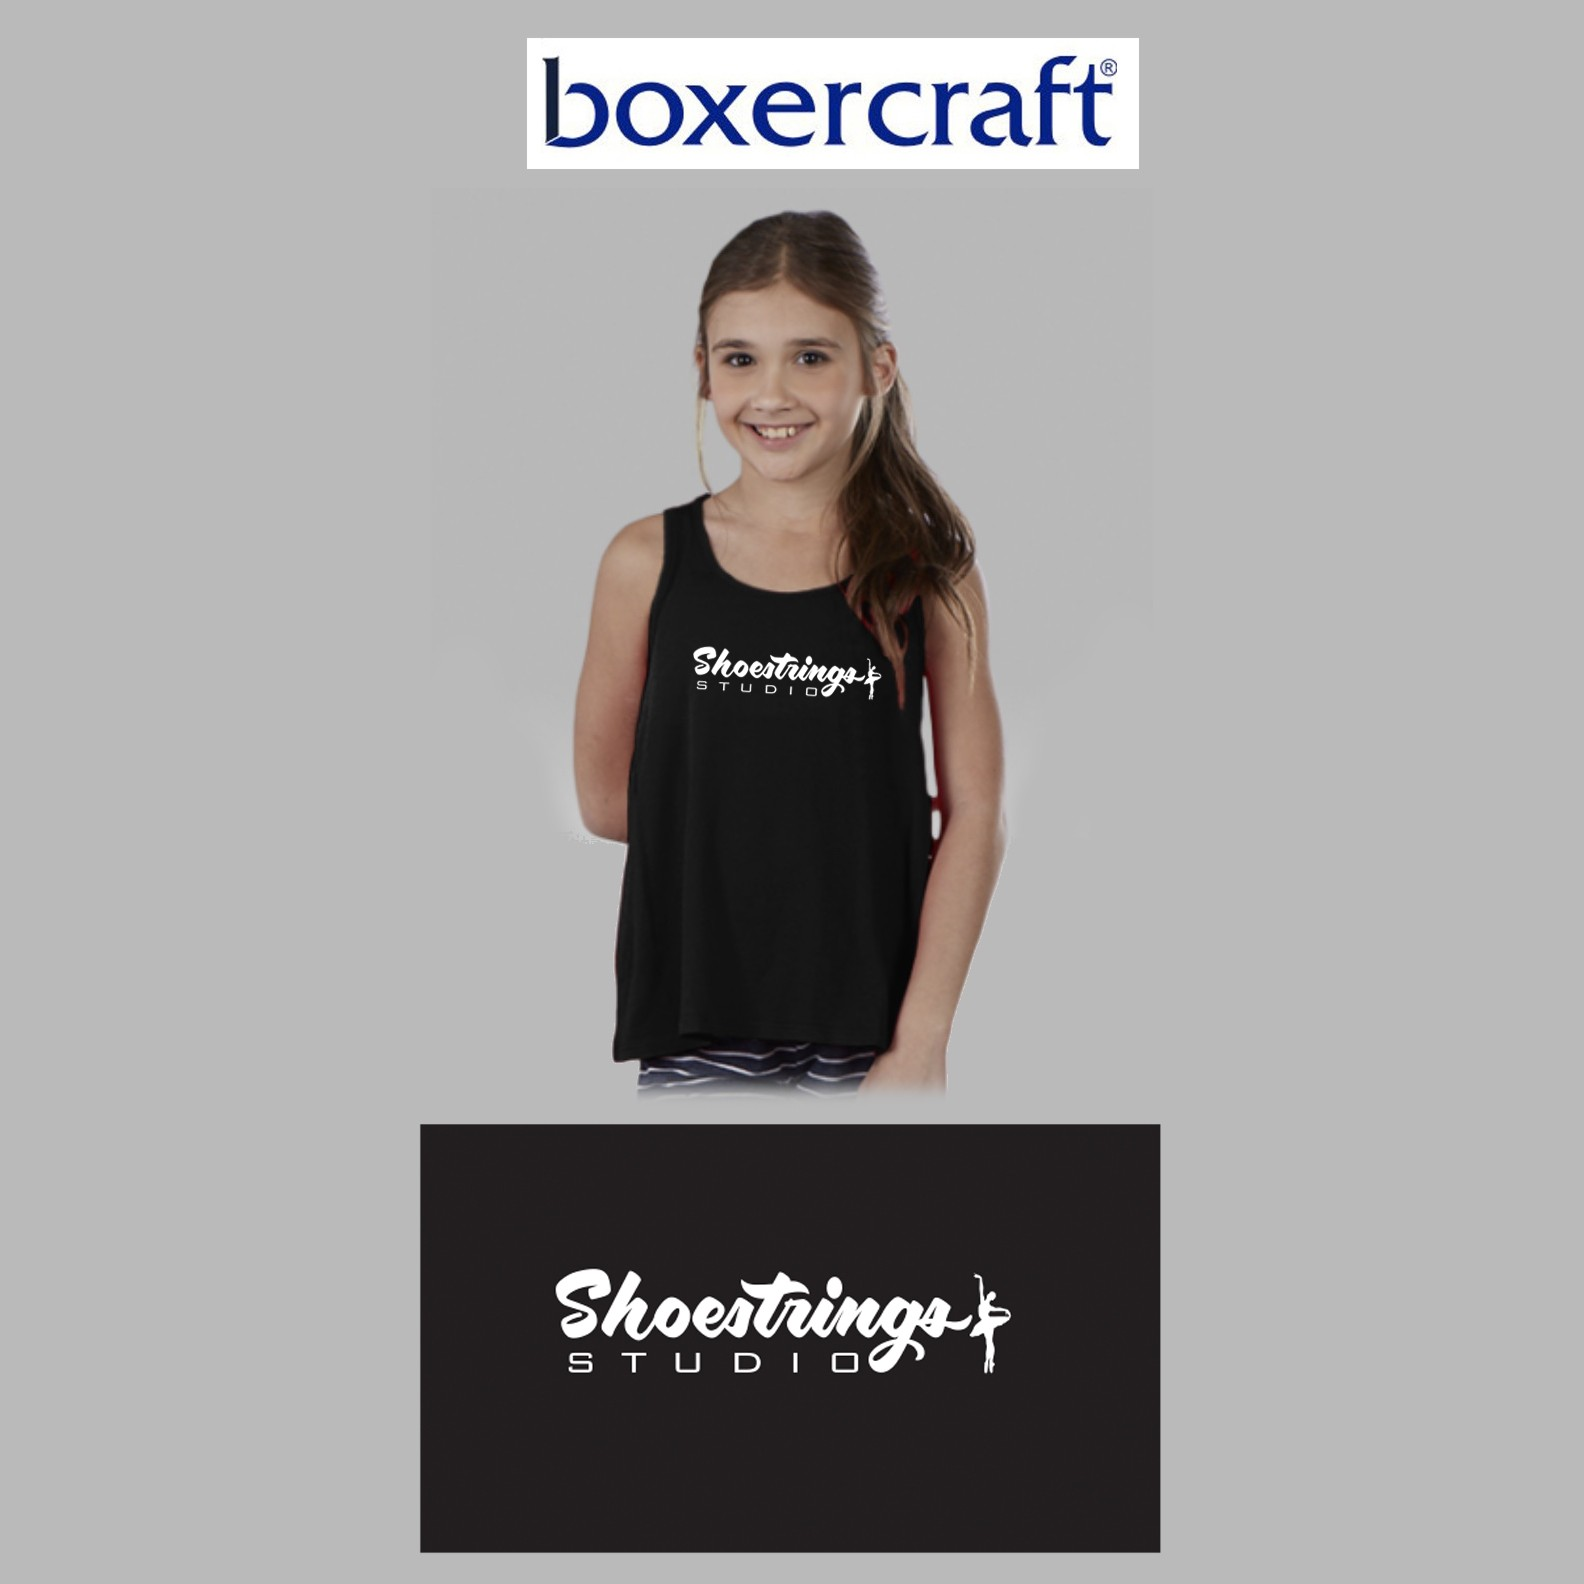 Shoestrings Studio Boxercraft Flare Tank, Youth